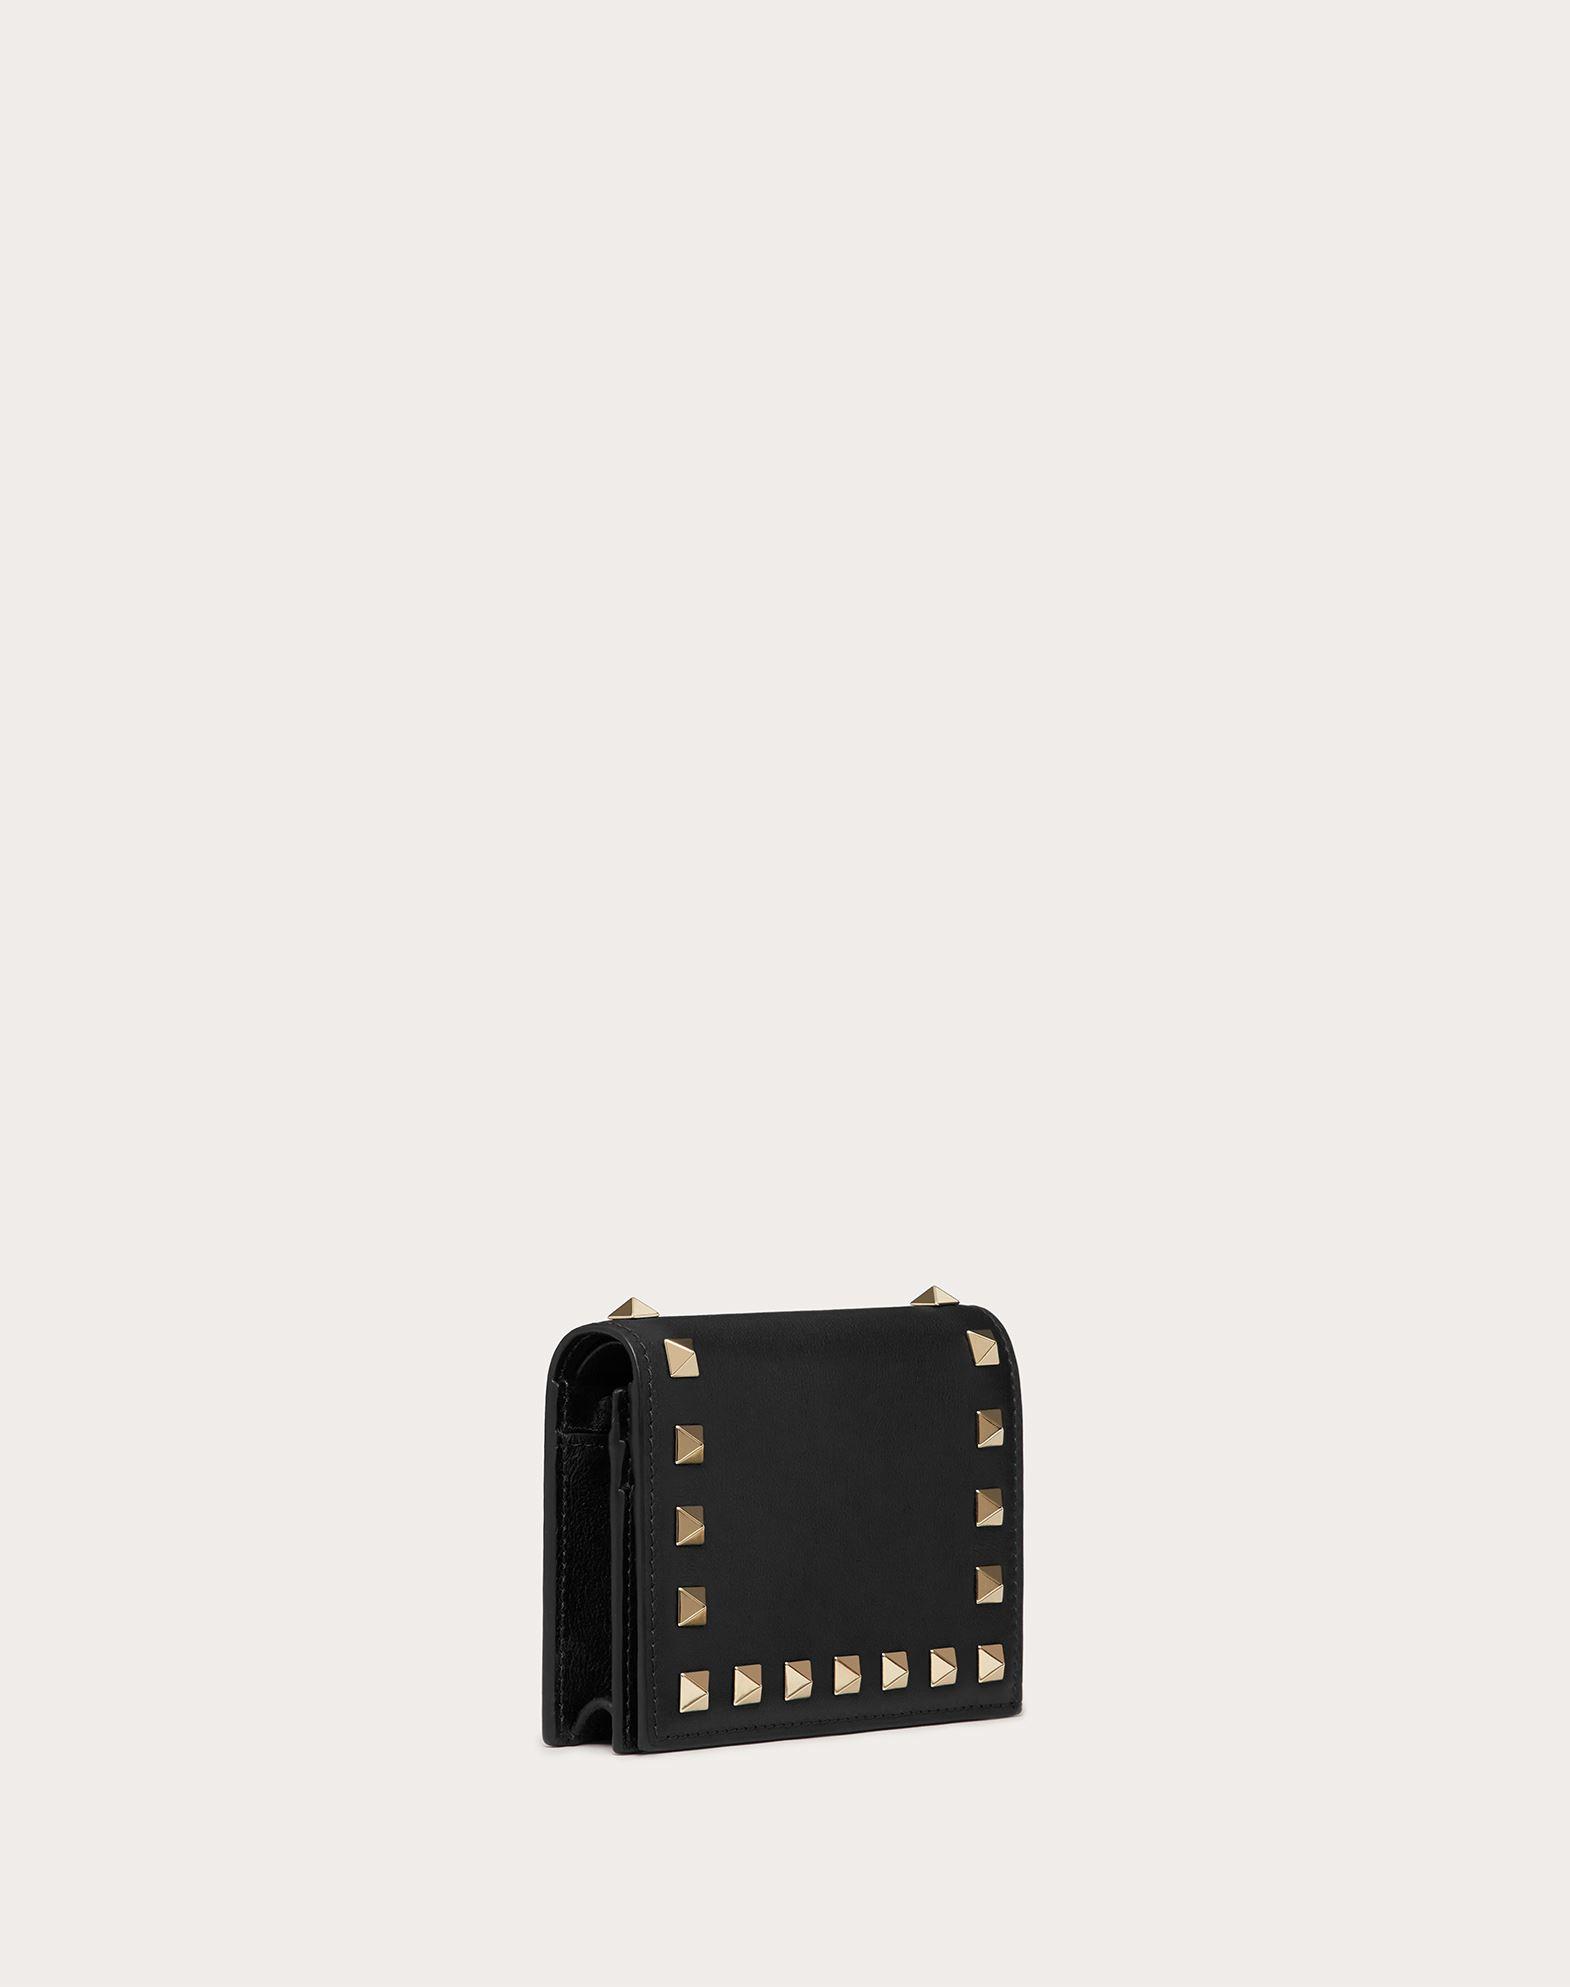 VALENTINO GARAVANI Compact Rockstud Wallet COMPACT WALLETS D e